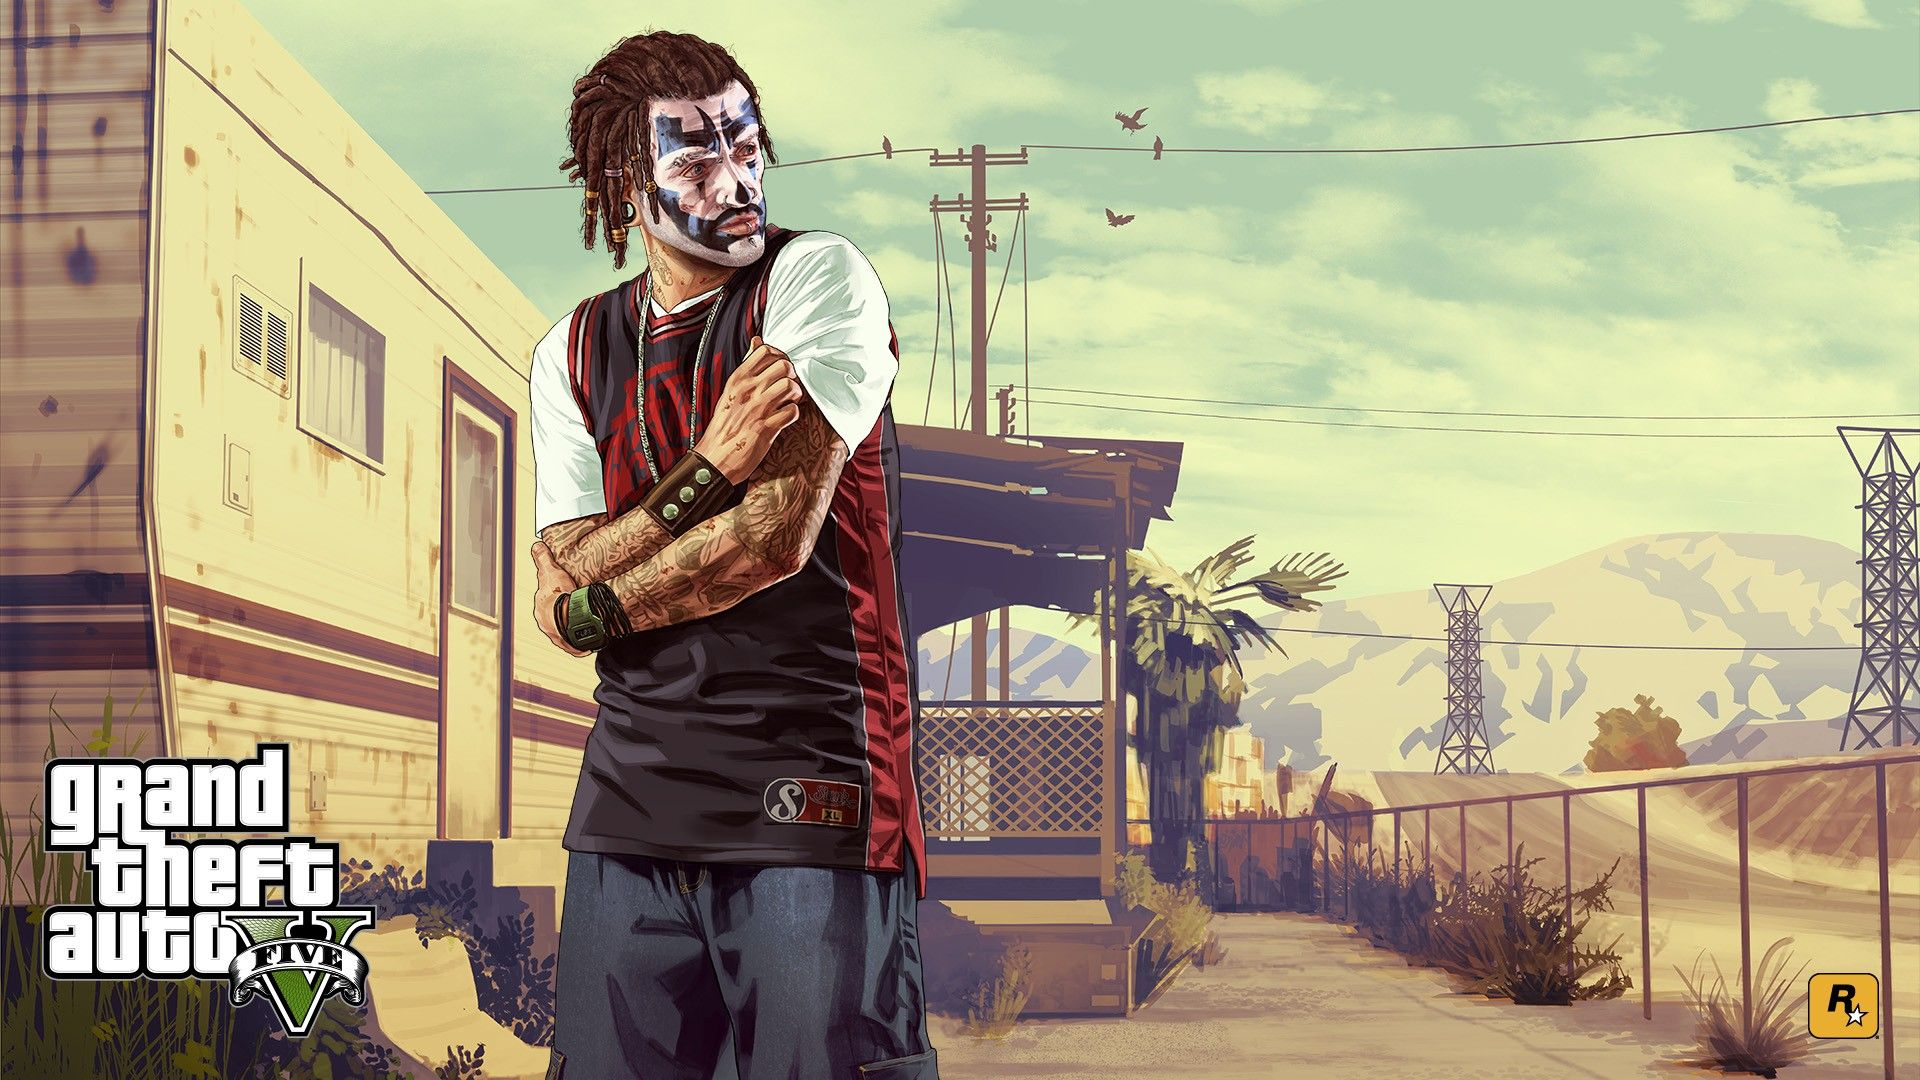 GTA V Wallpaper p HD История искусства, История, Картинки